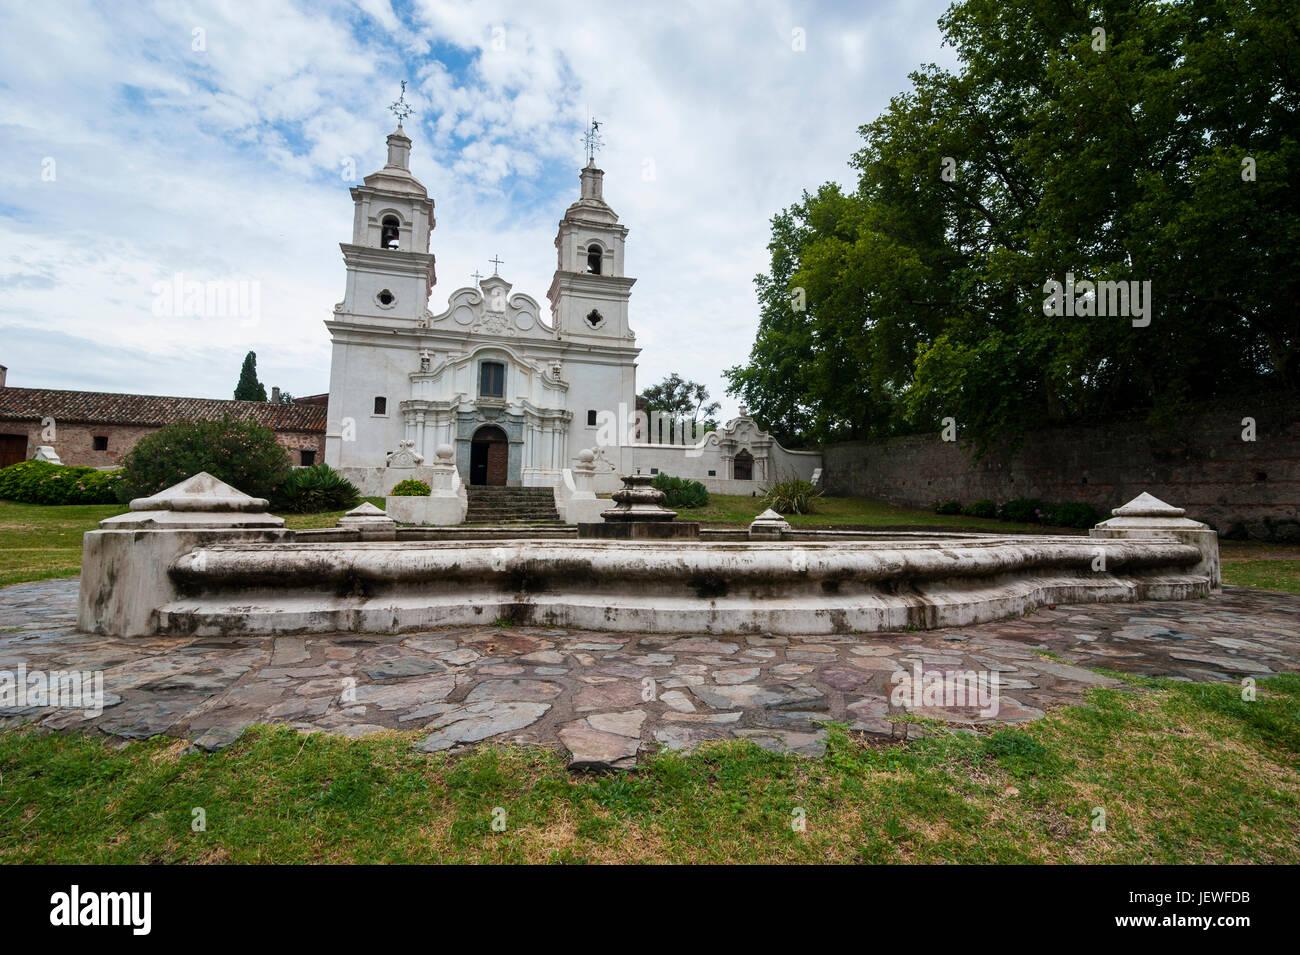 UNESCO World Heritage sight the mission of San Ignacio Mini, Misiones Province, Argentina, South America - Stock Image